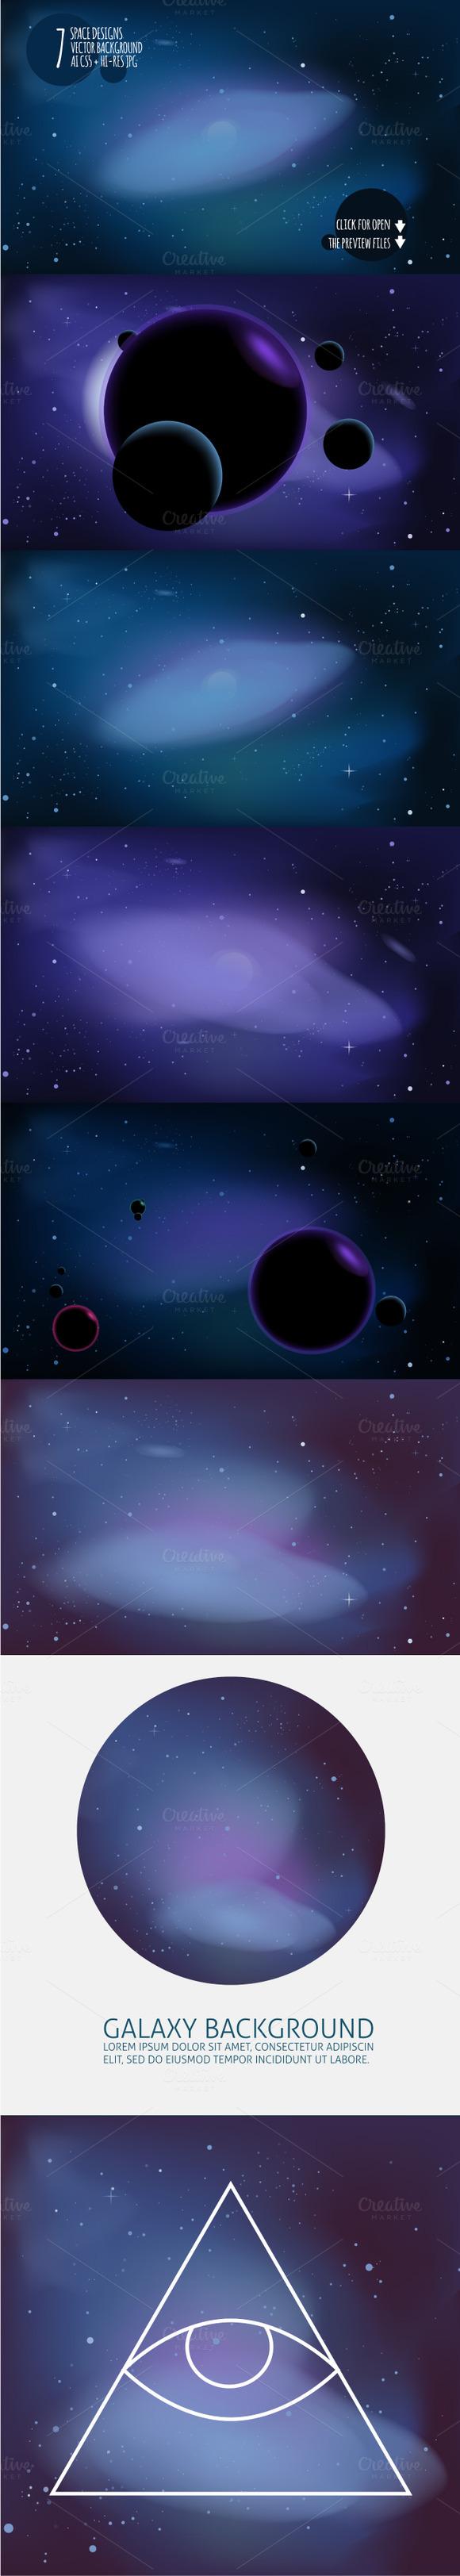 7 Space Designs